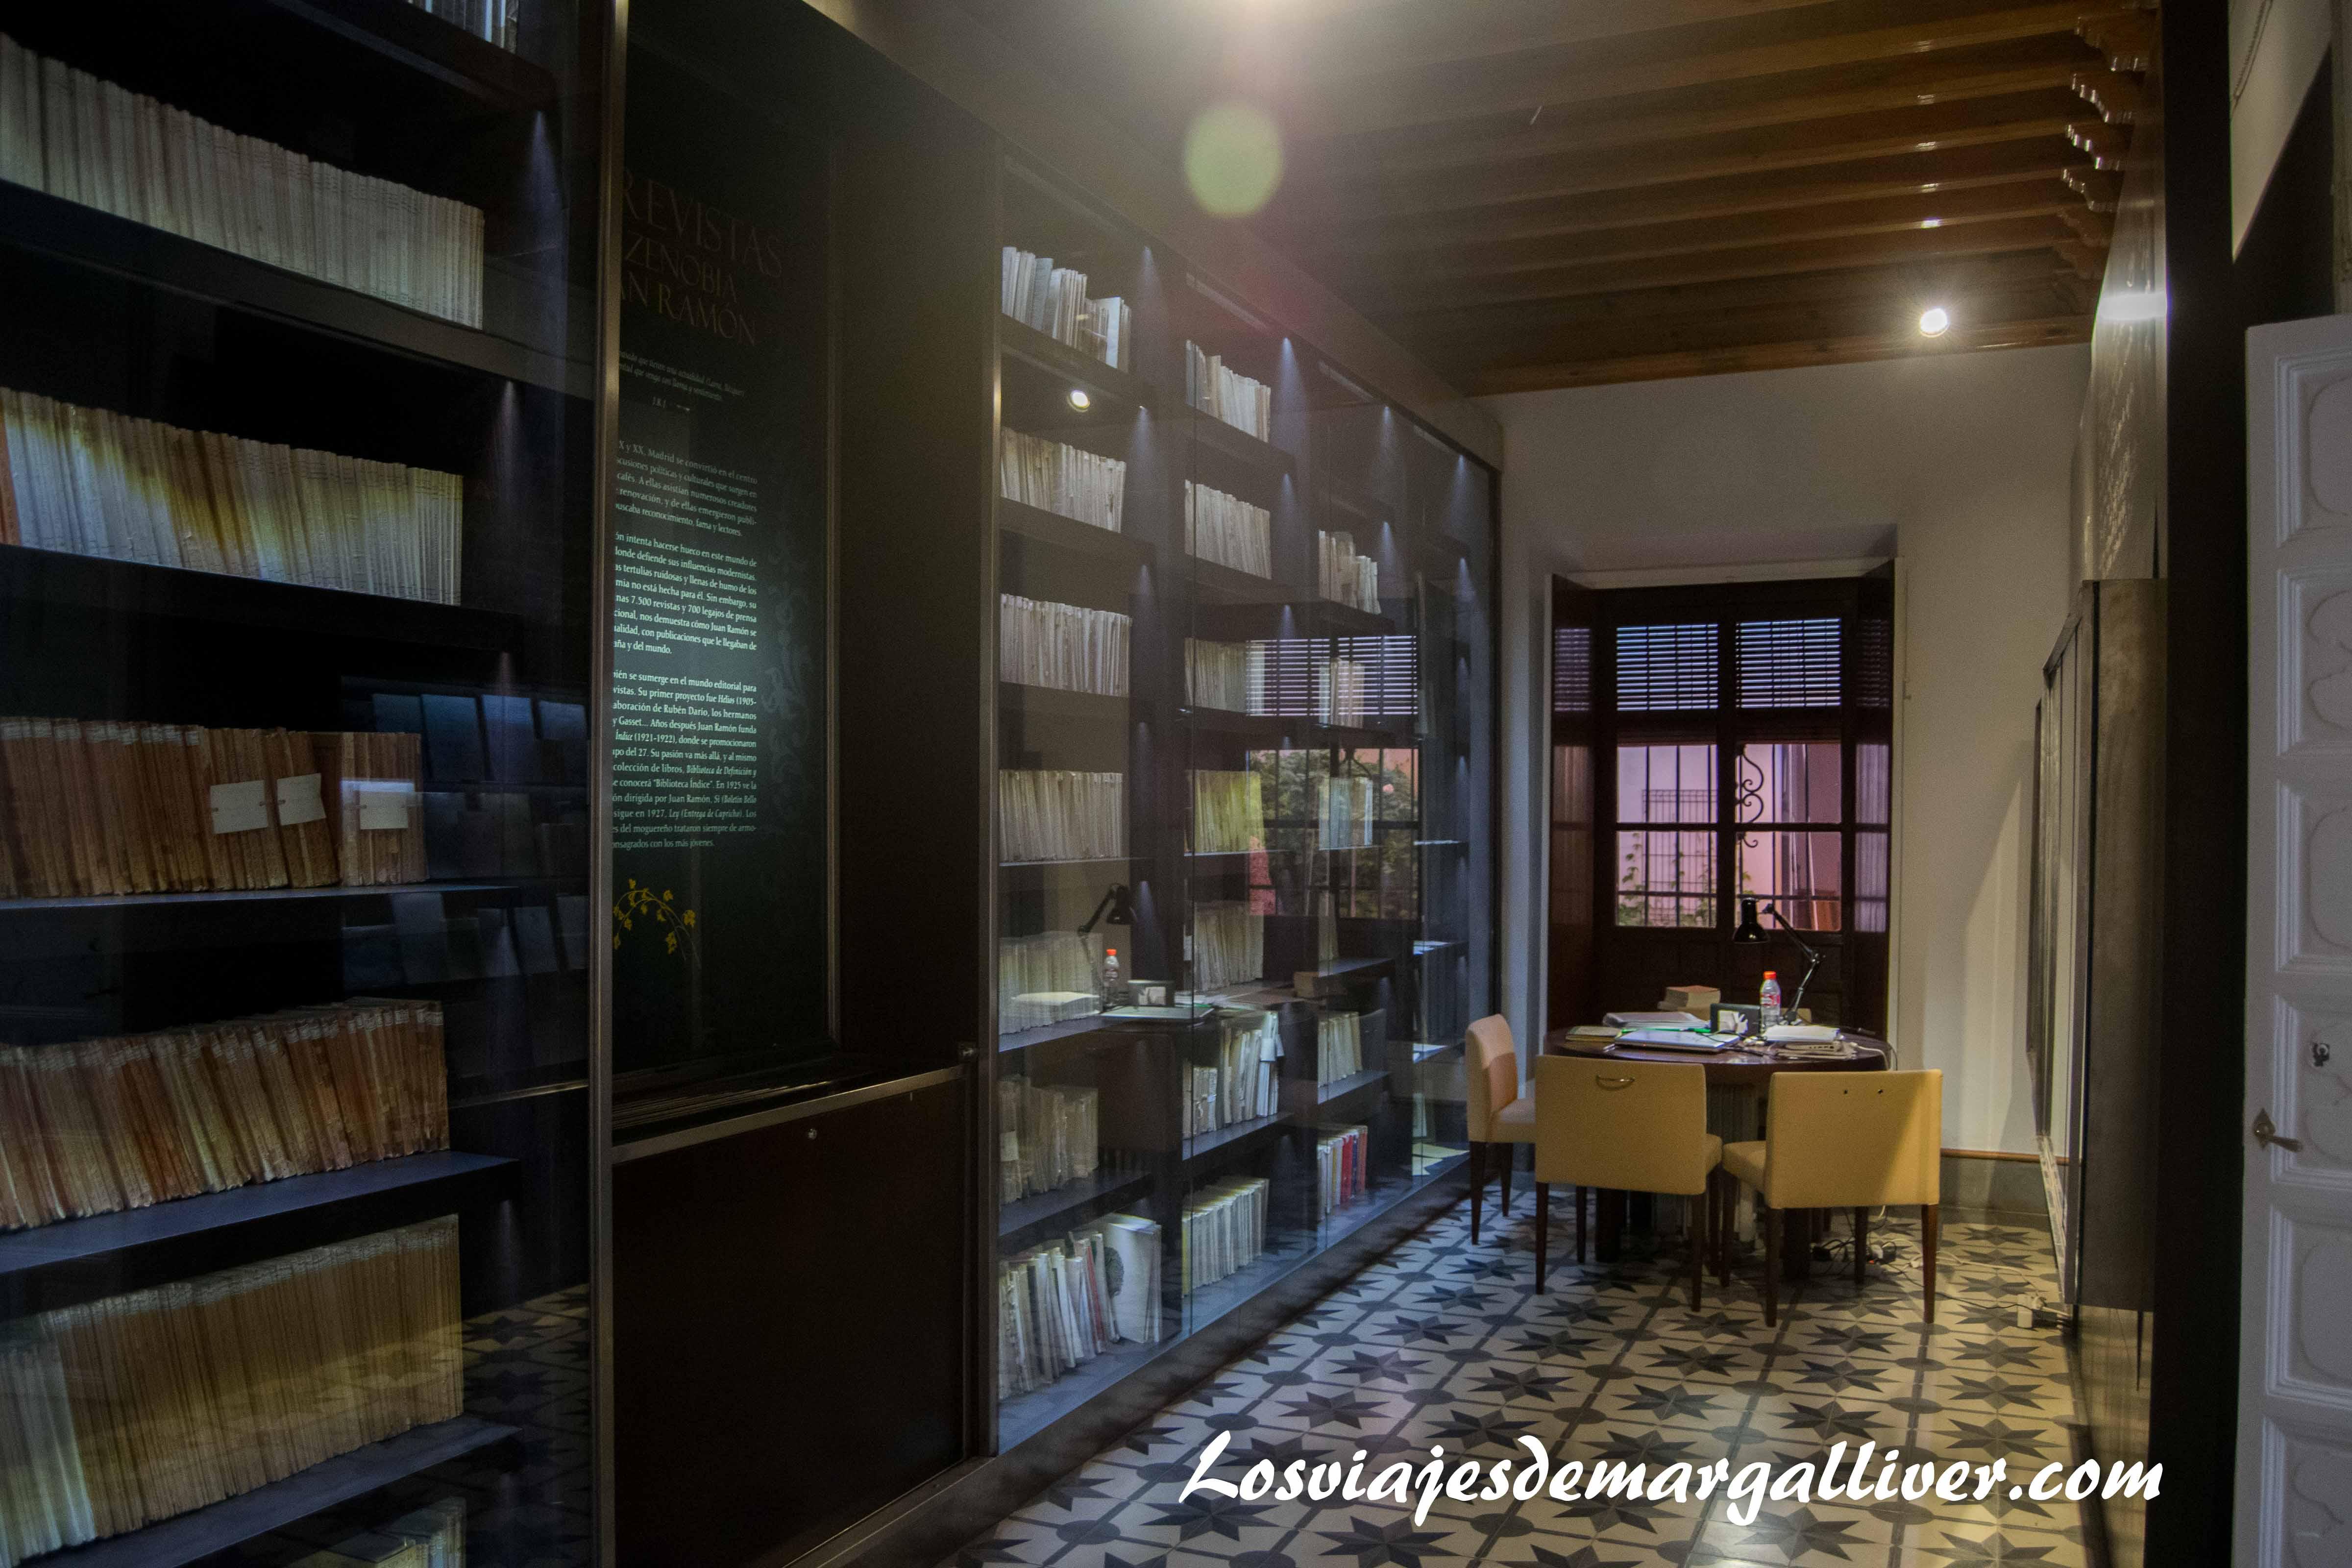 BIblioteca de la casa museo JR Jiménez - Zenobia en Moguer - Los viajes de Margalliver